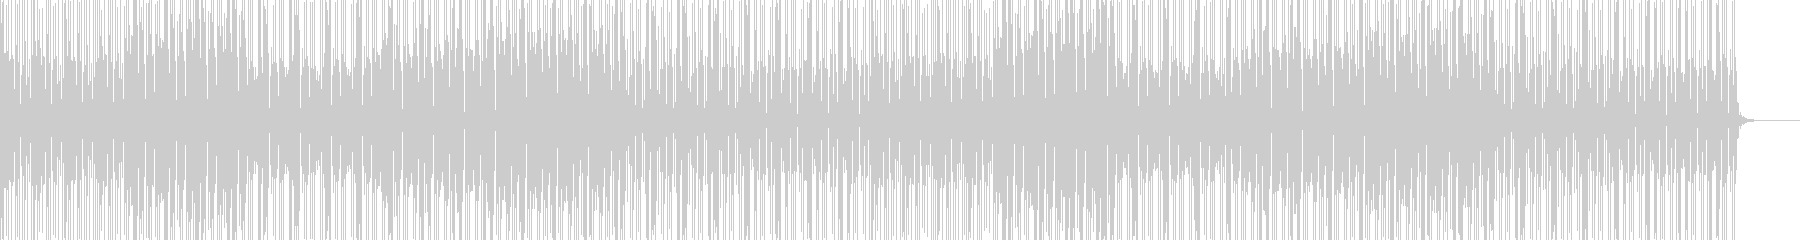 R&Bの未再生の波形